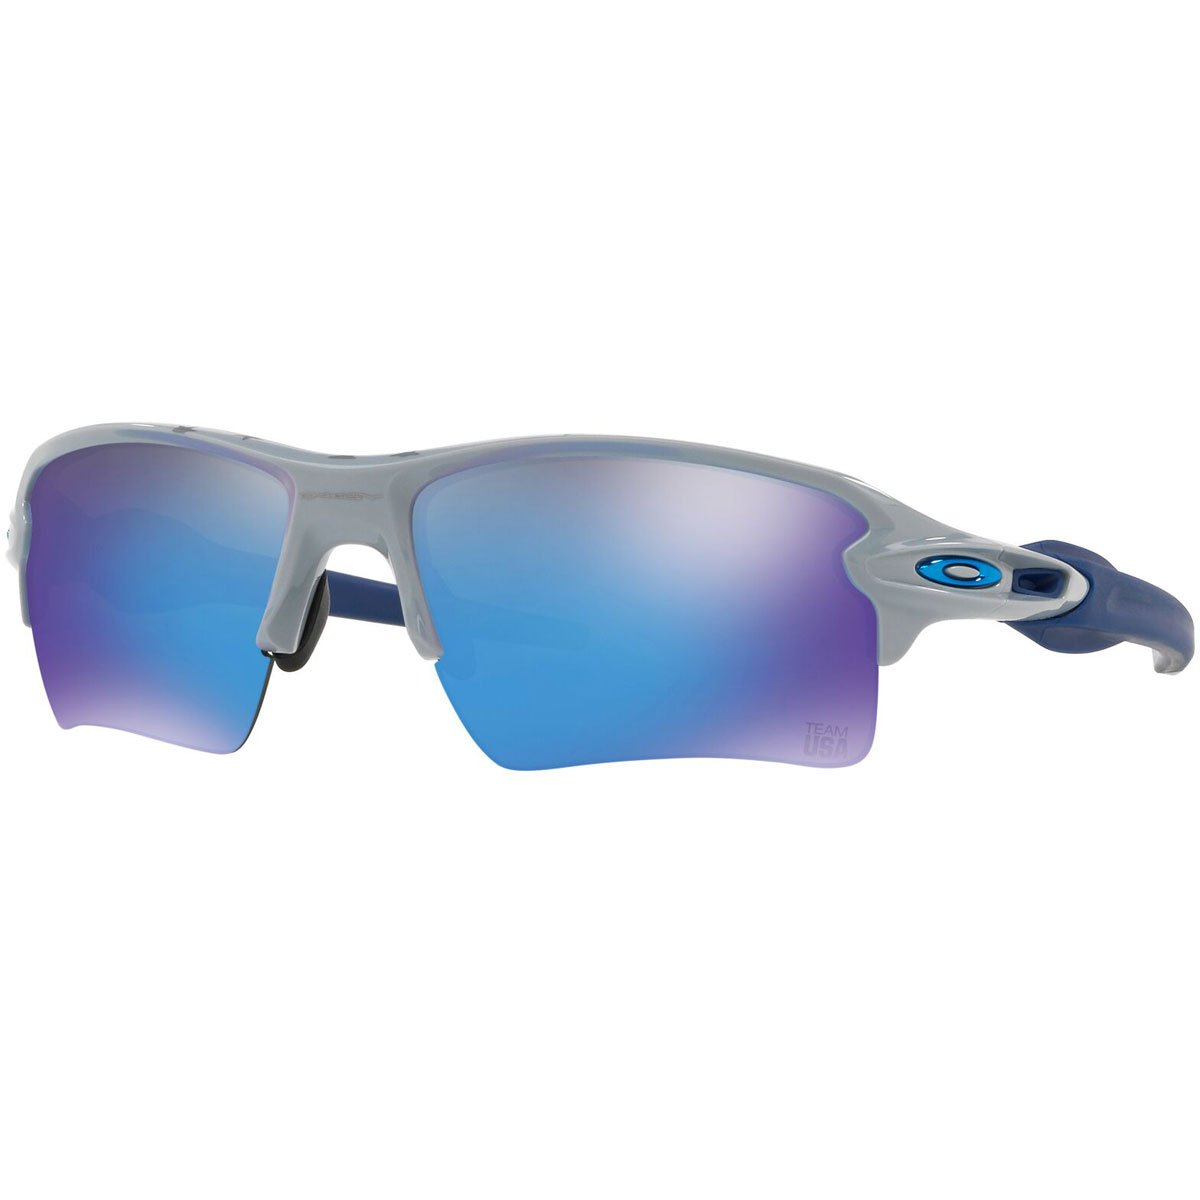 c29987c380 Galleon - Oakley Men s Flak 2.0 XL Sunglasses